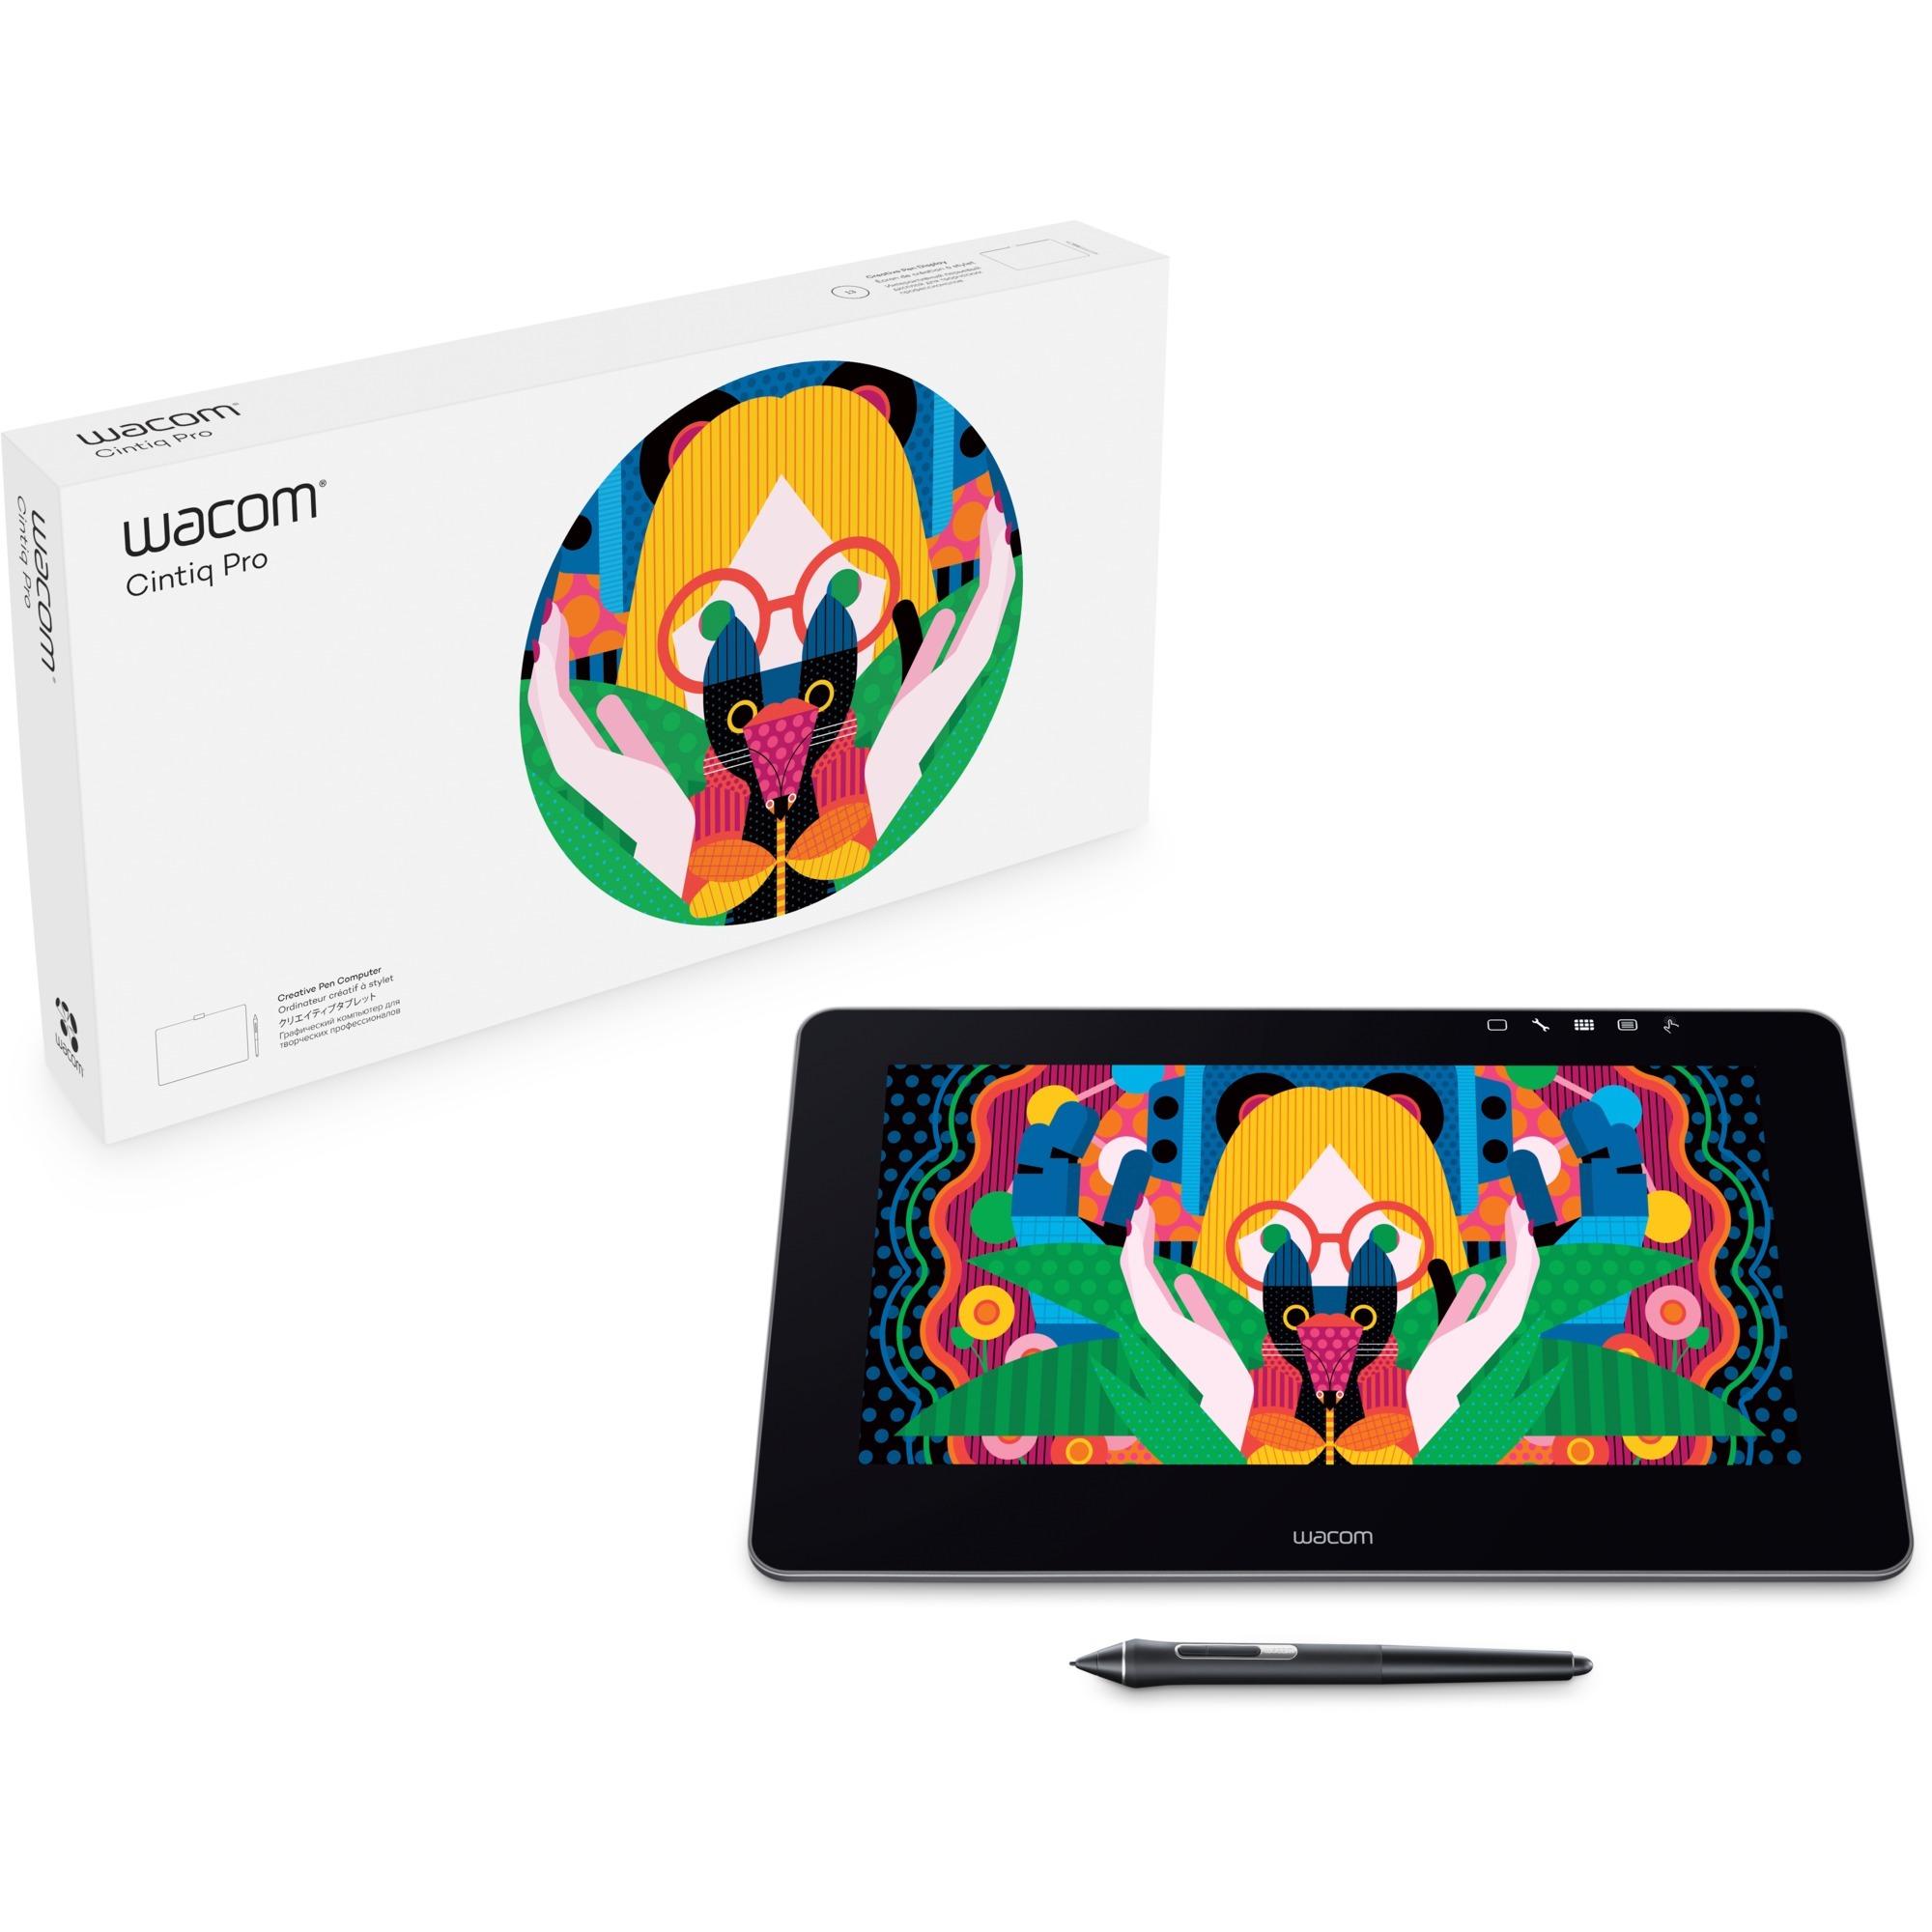 Cintiq Pro 13 tableta digitalizadora 5080 294 x 166 mm USB Negro, Tableta gráfica